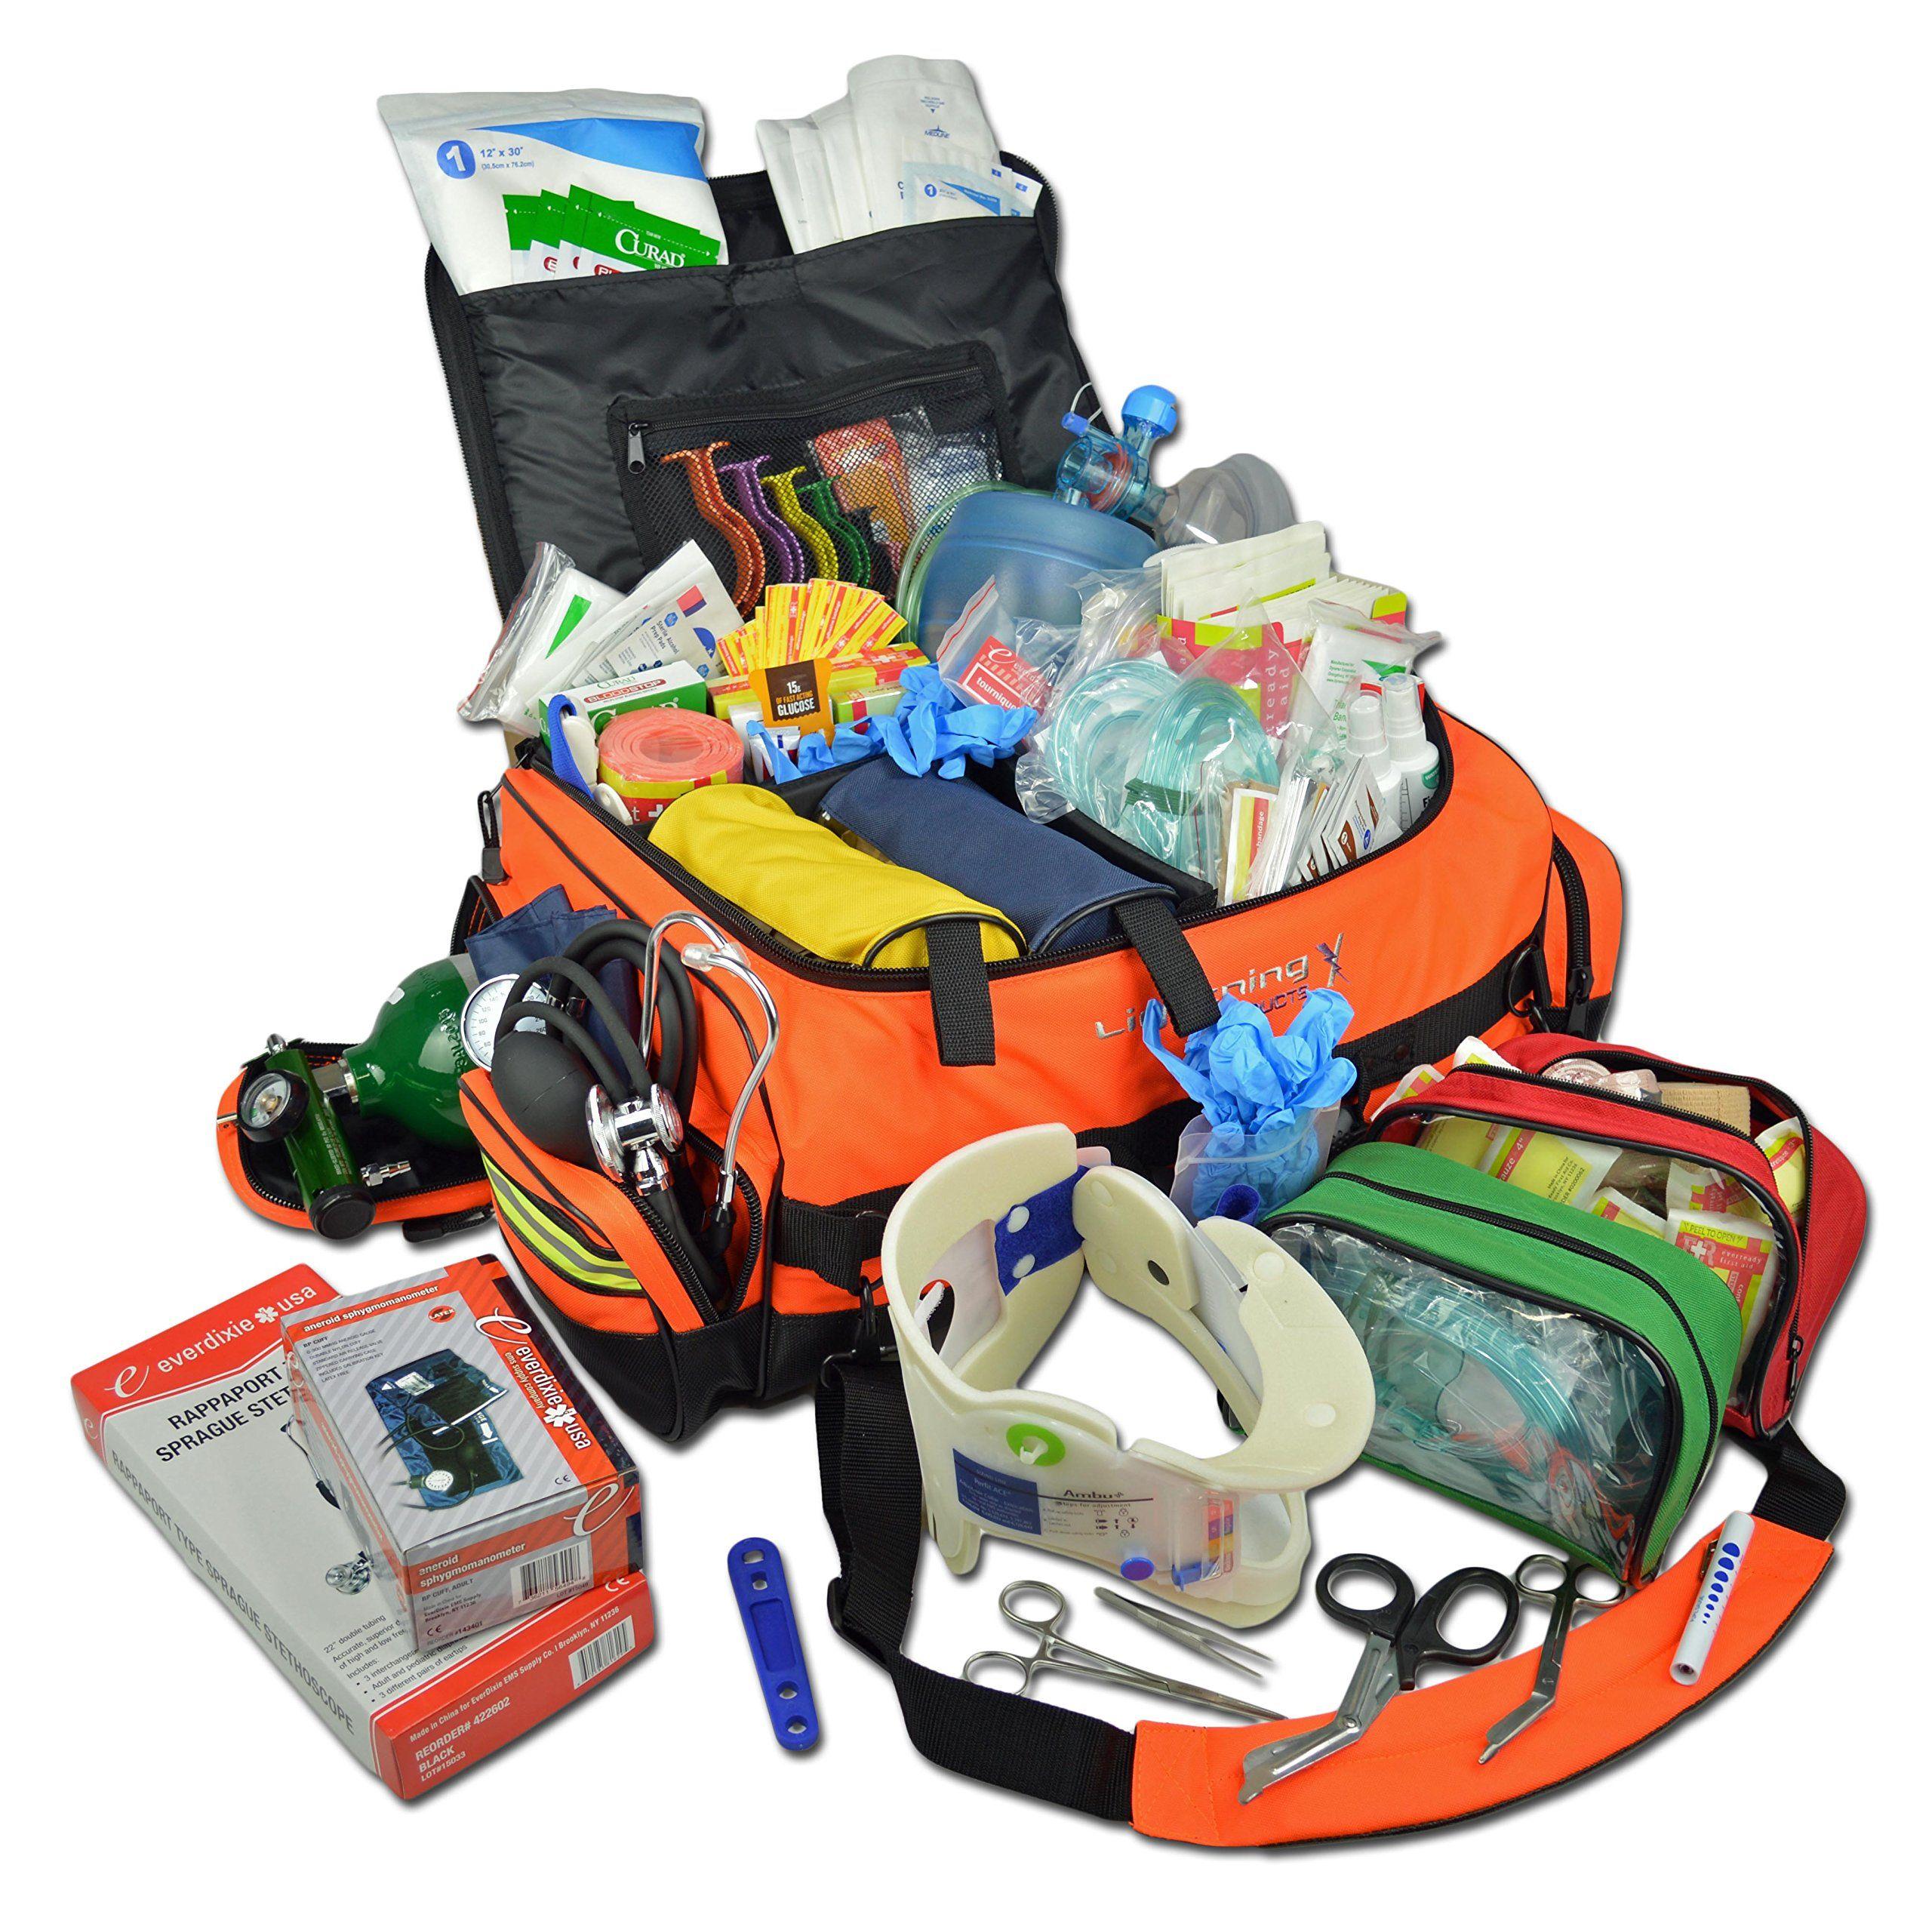 Lightning X Jumbo Medic First Responder EMT Trauma Bag